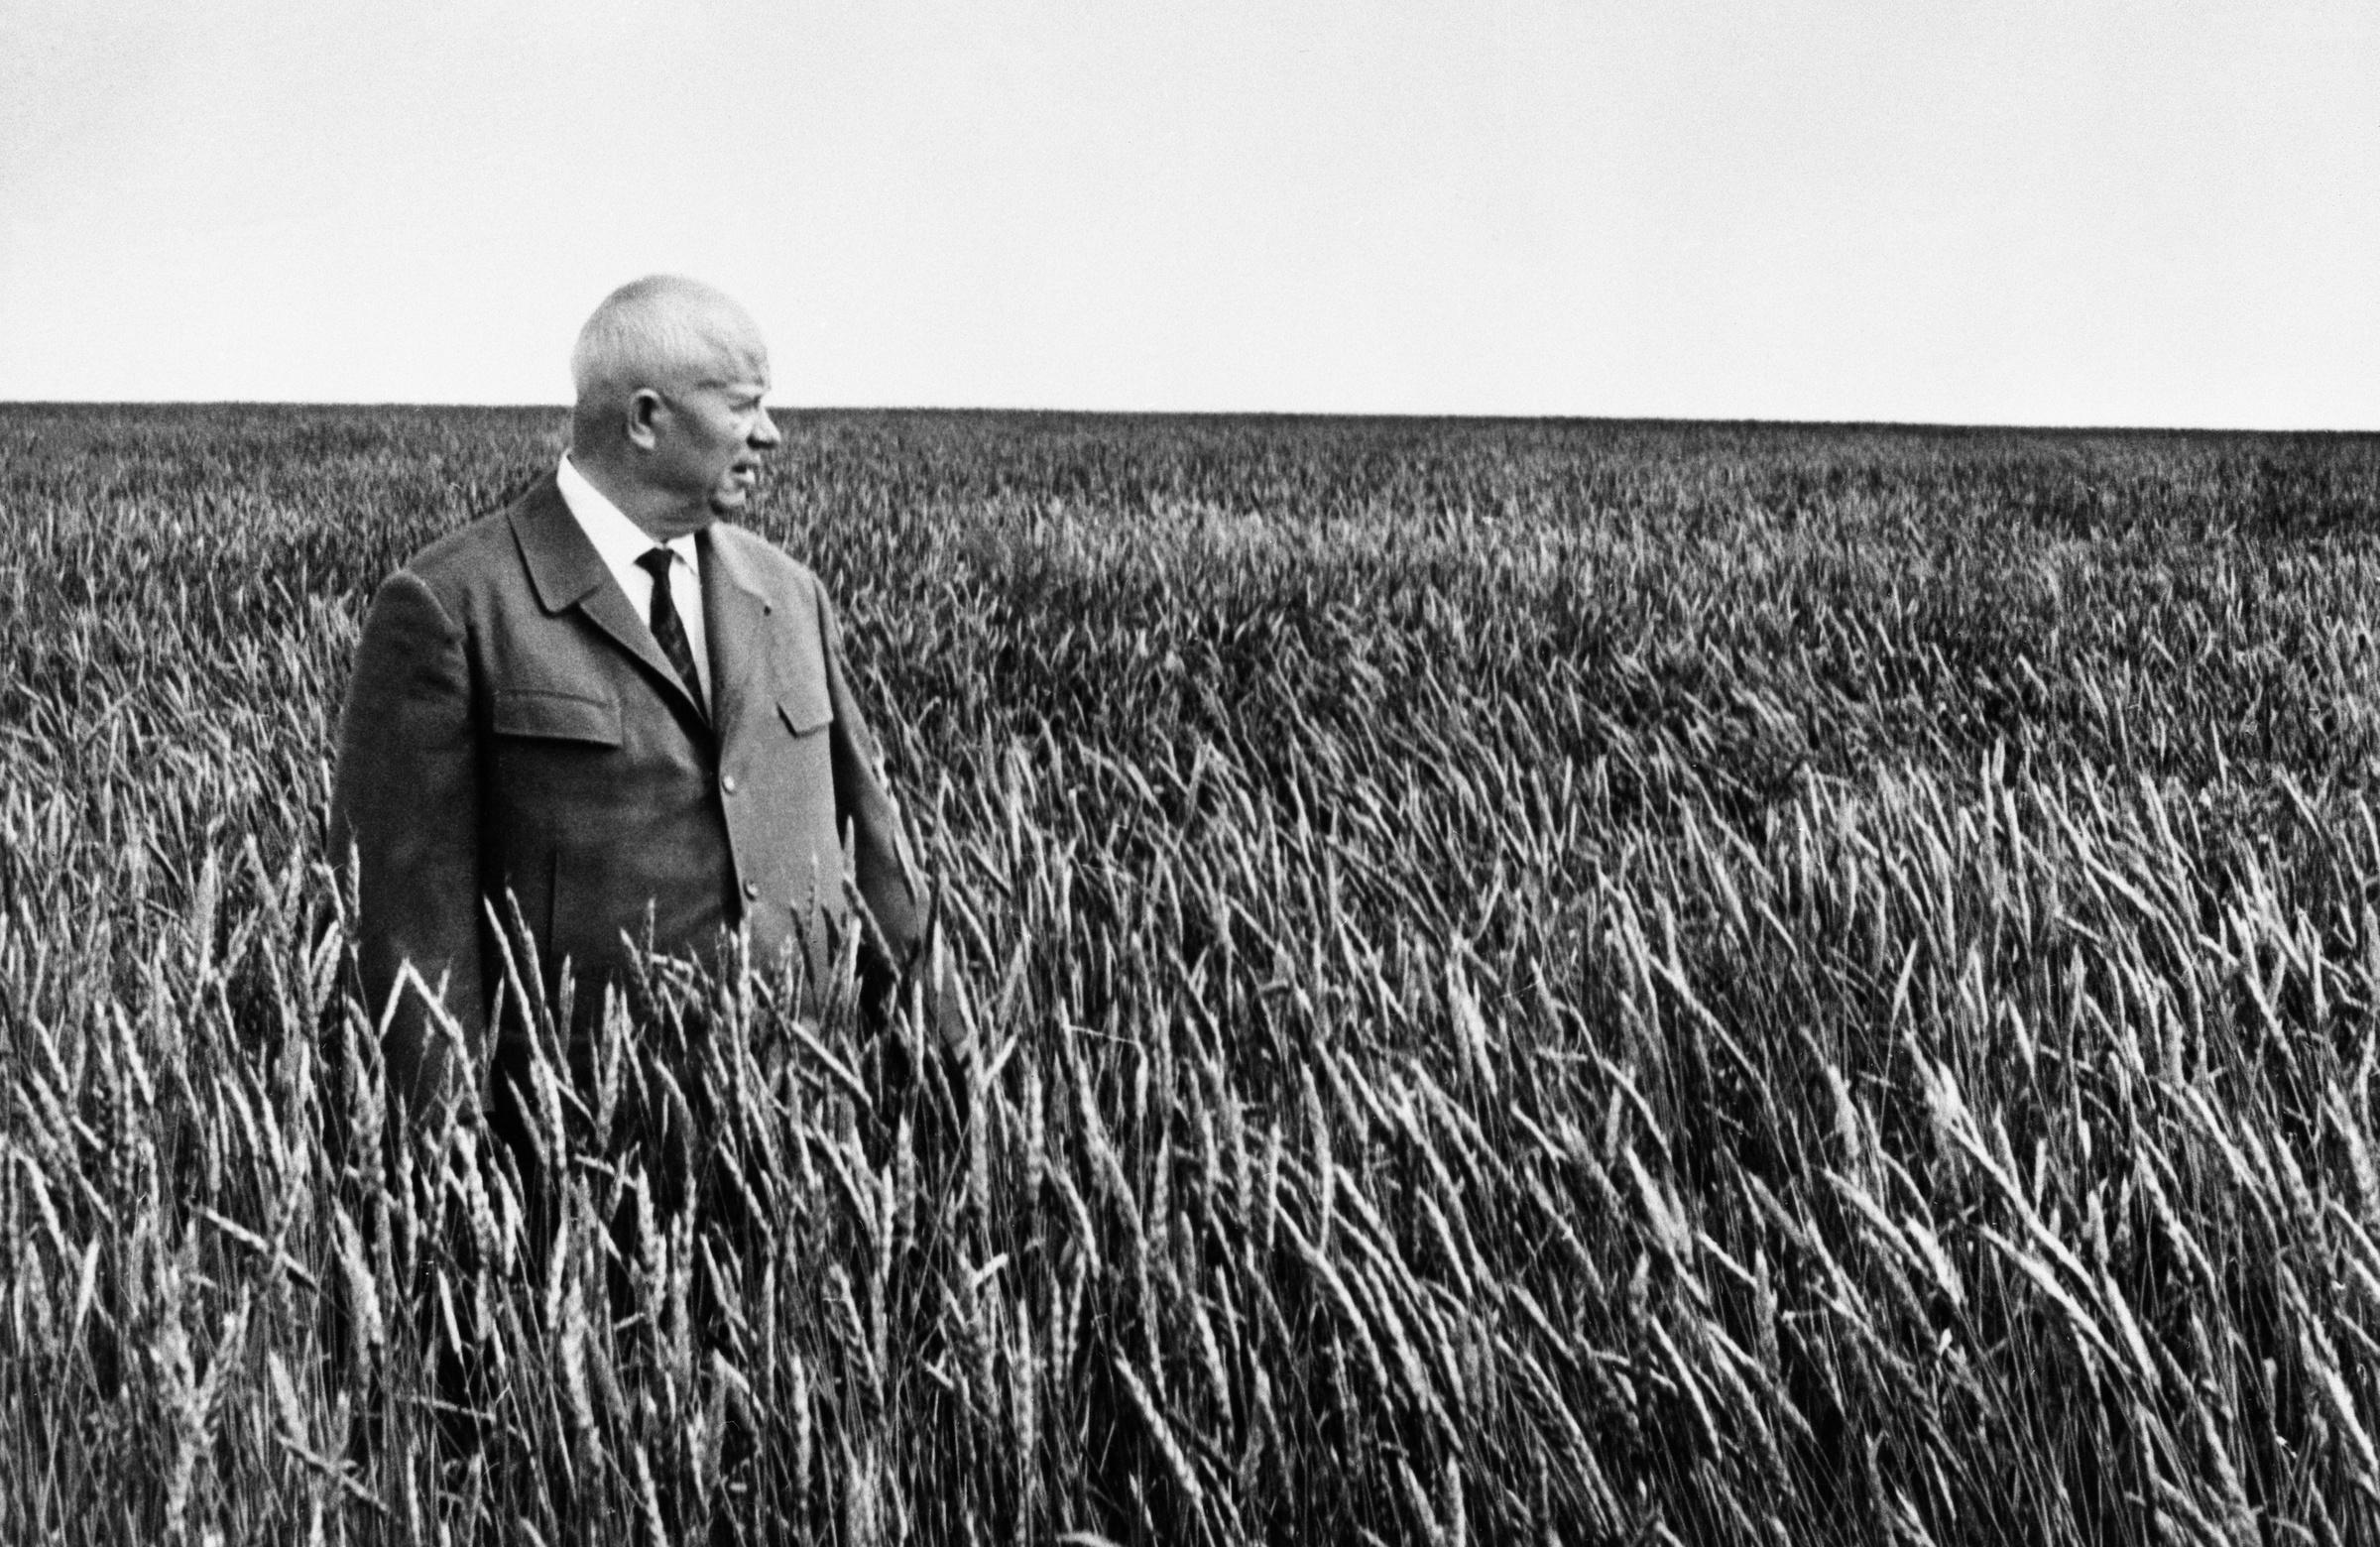 Фото © Getty Images / Bettmann Archive